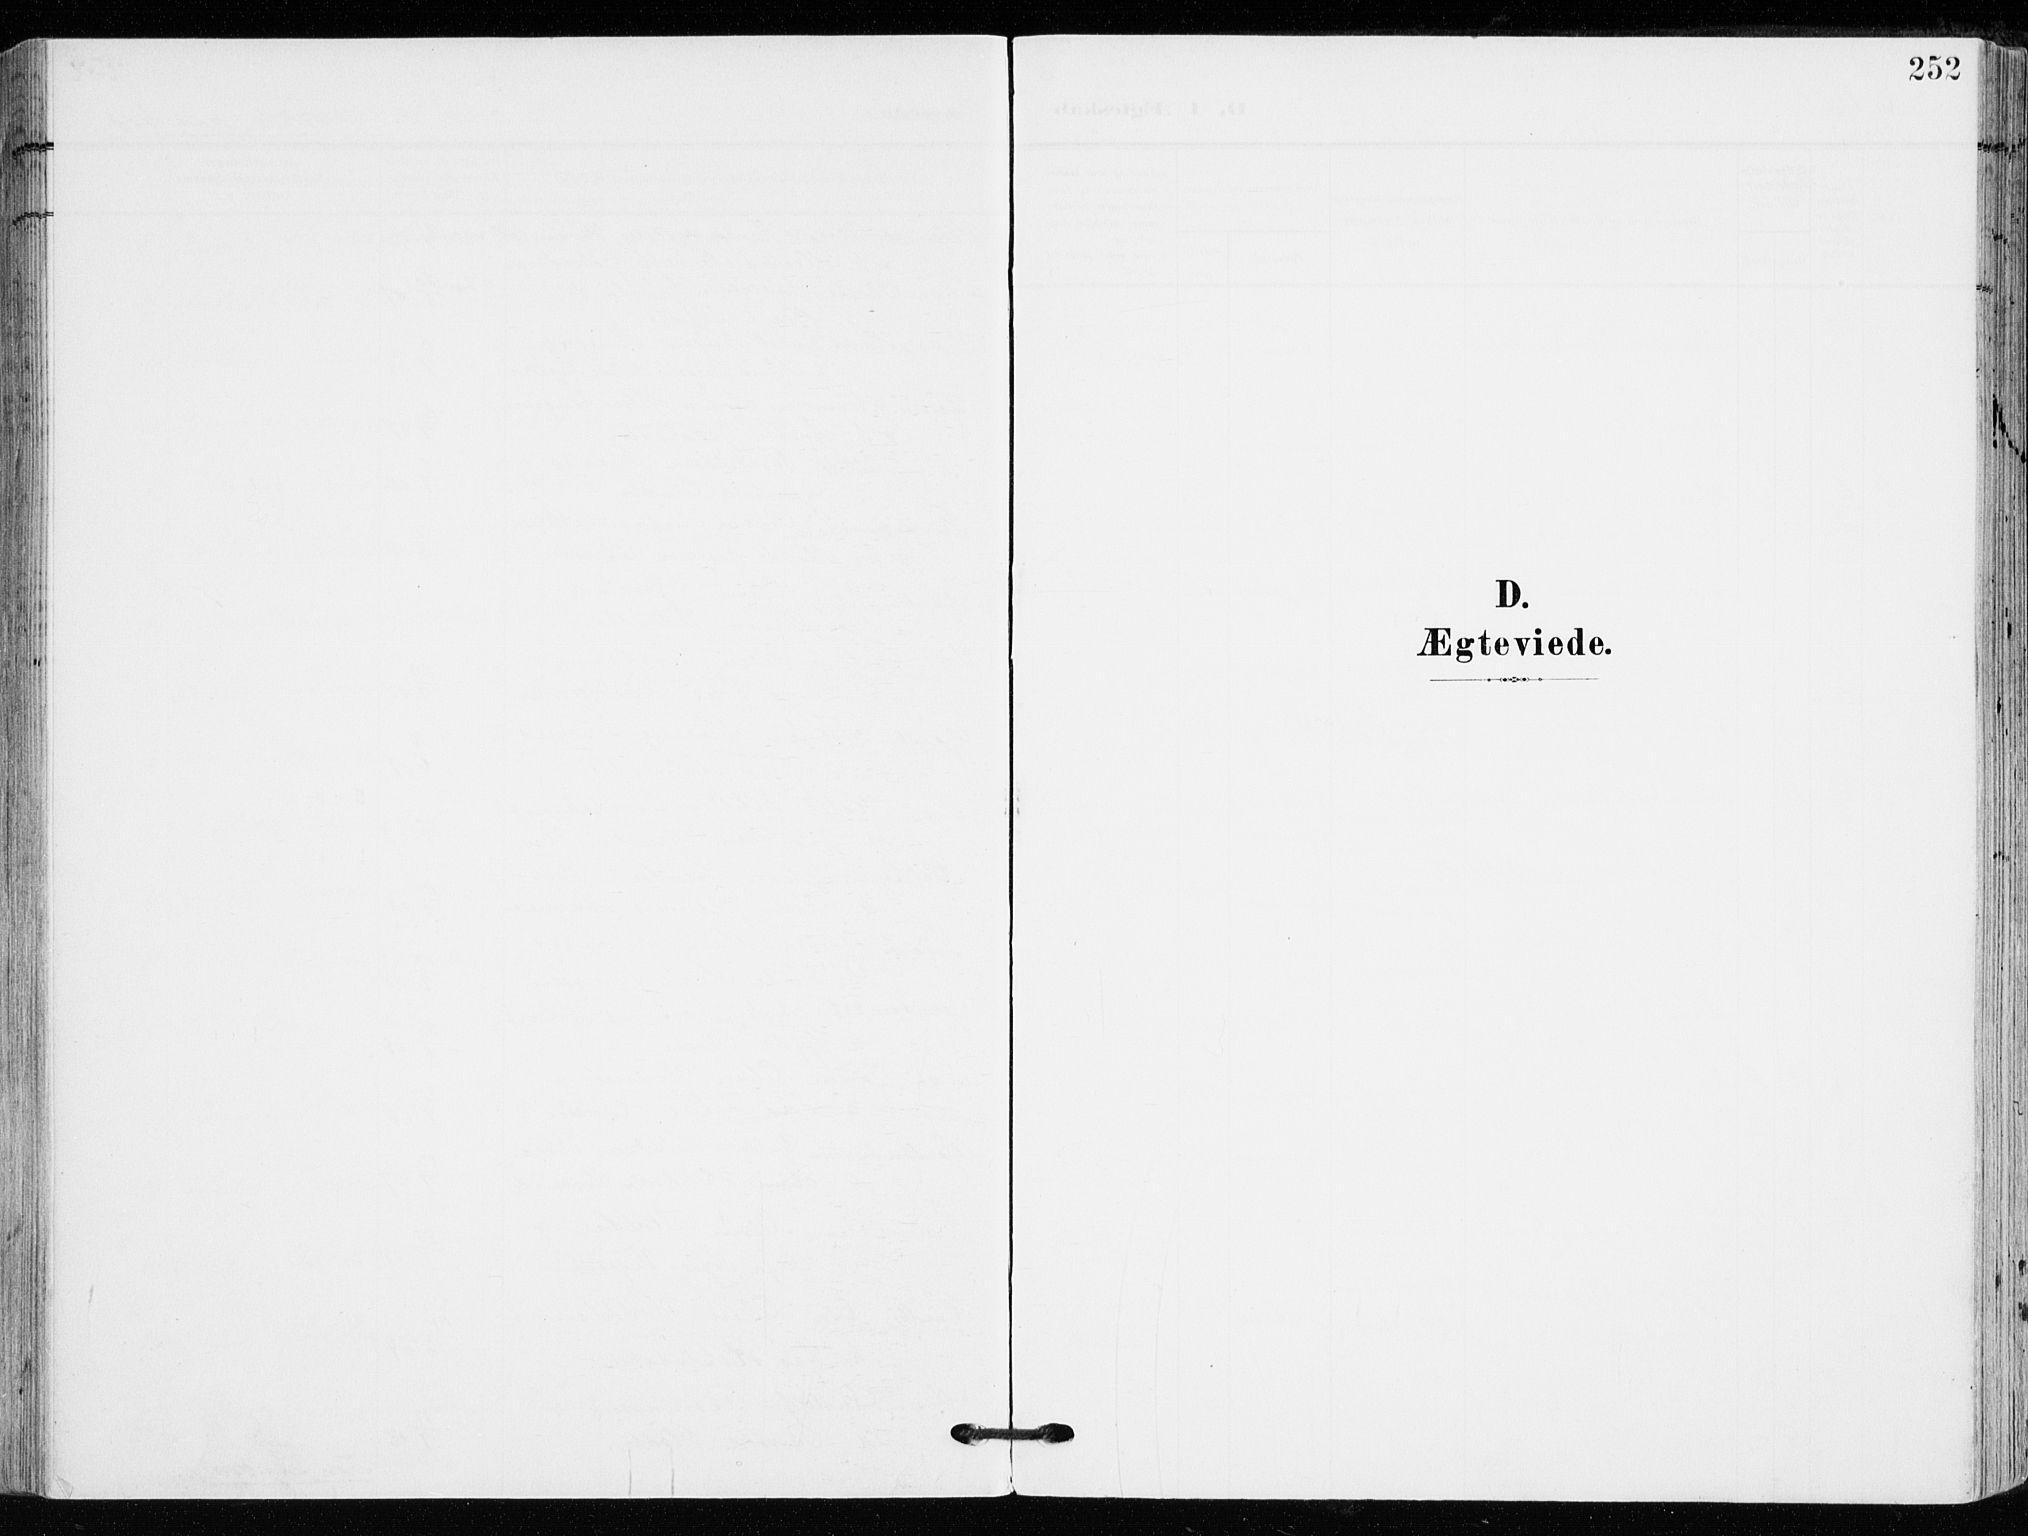 SAKO, Kongsberg kirkebøker, F/Fb/L0004: Ministerialbok nr. II 4, 1906-1918, s. 252